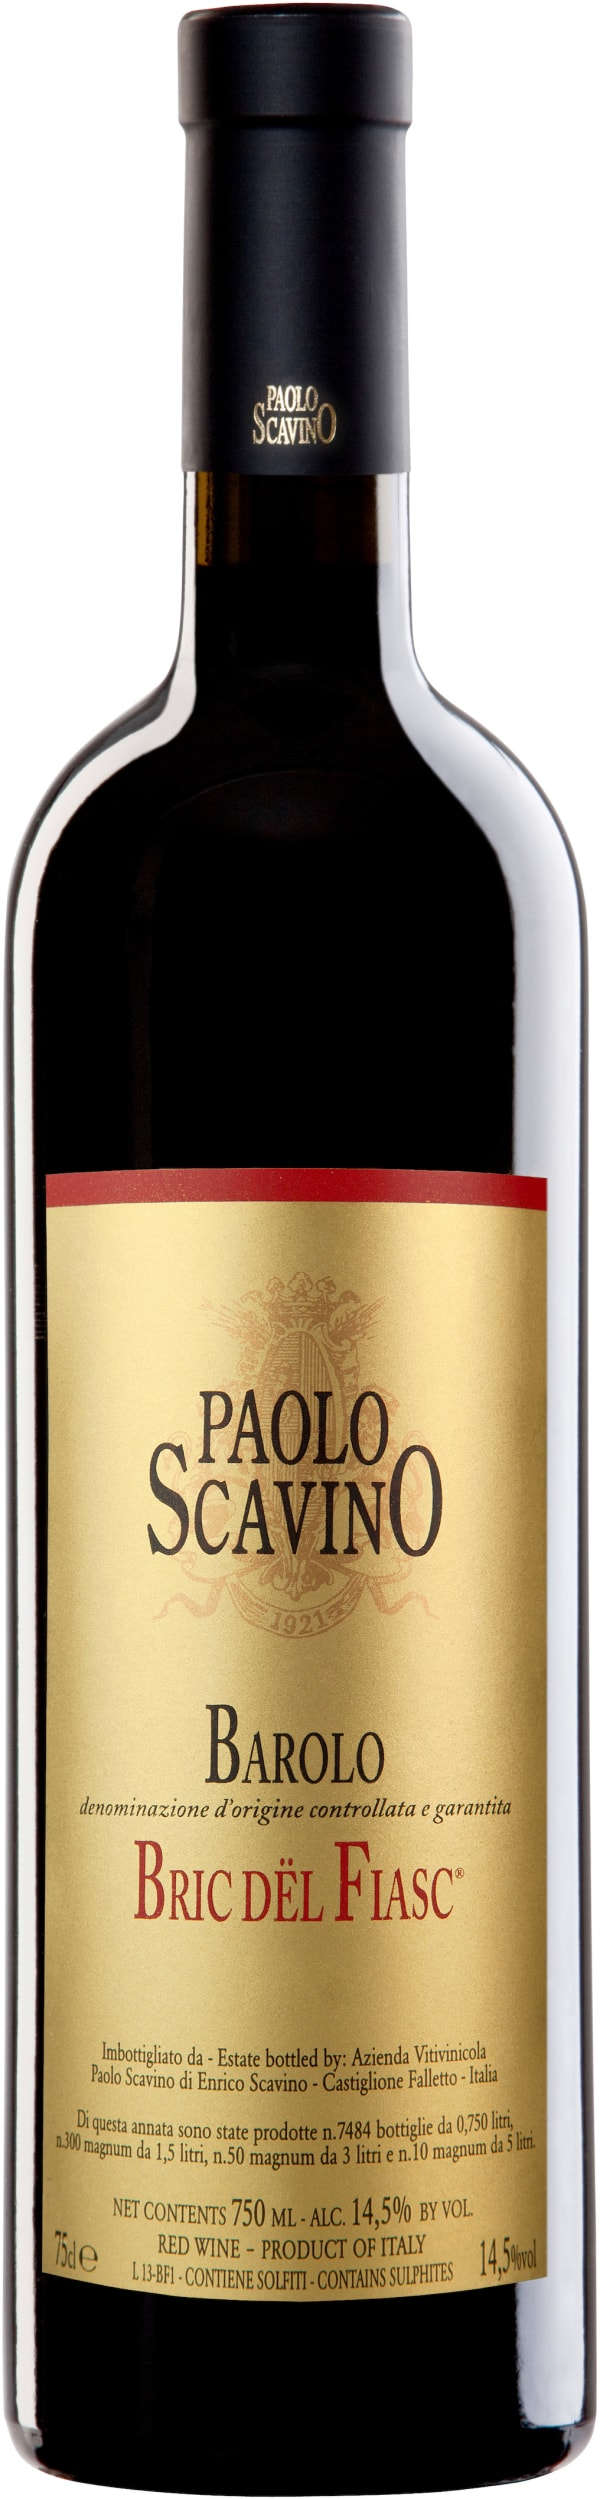 Paolo Scavino Barolo Bric dël Fiasc 2014